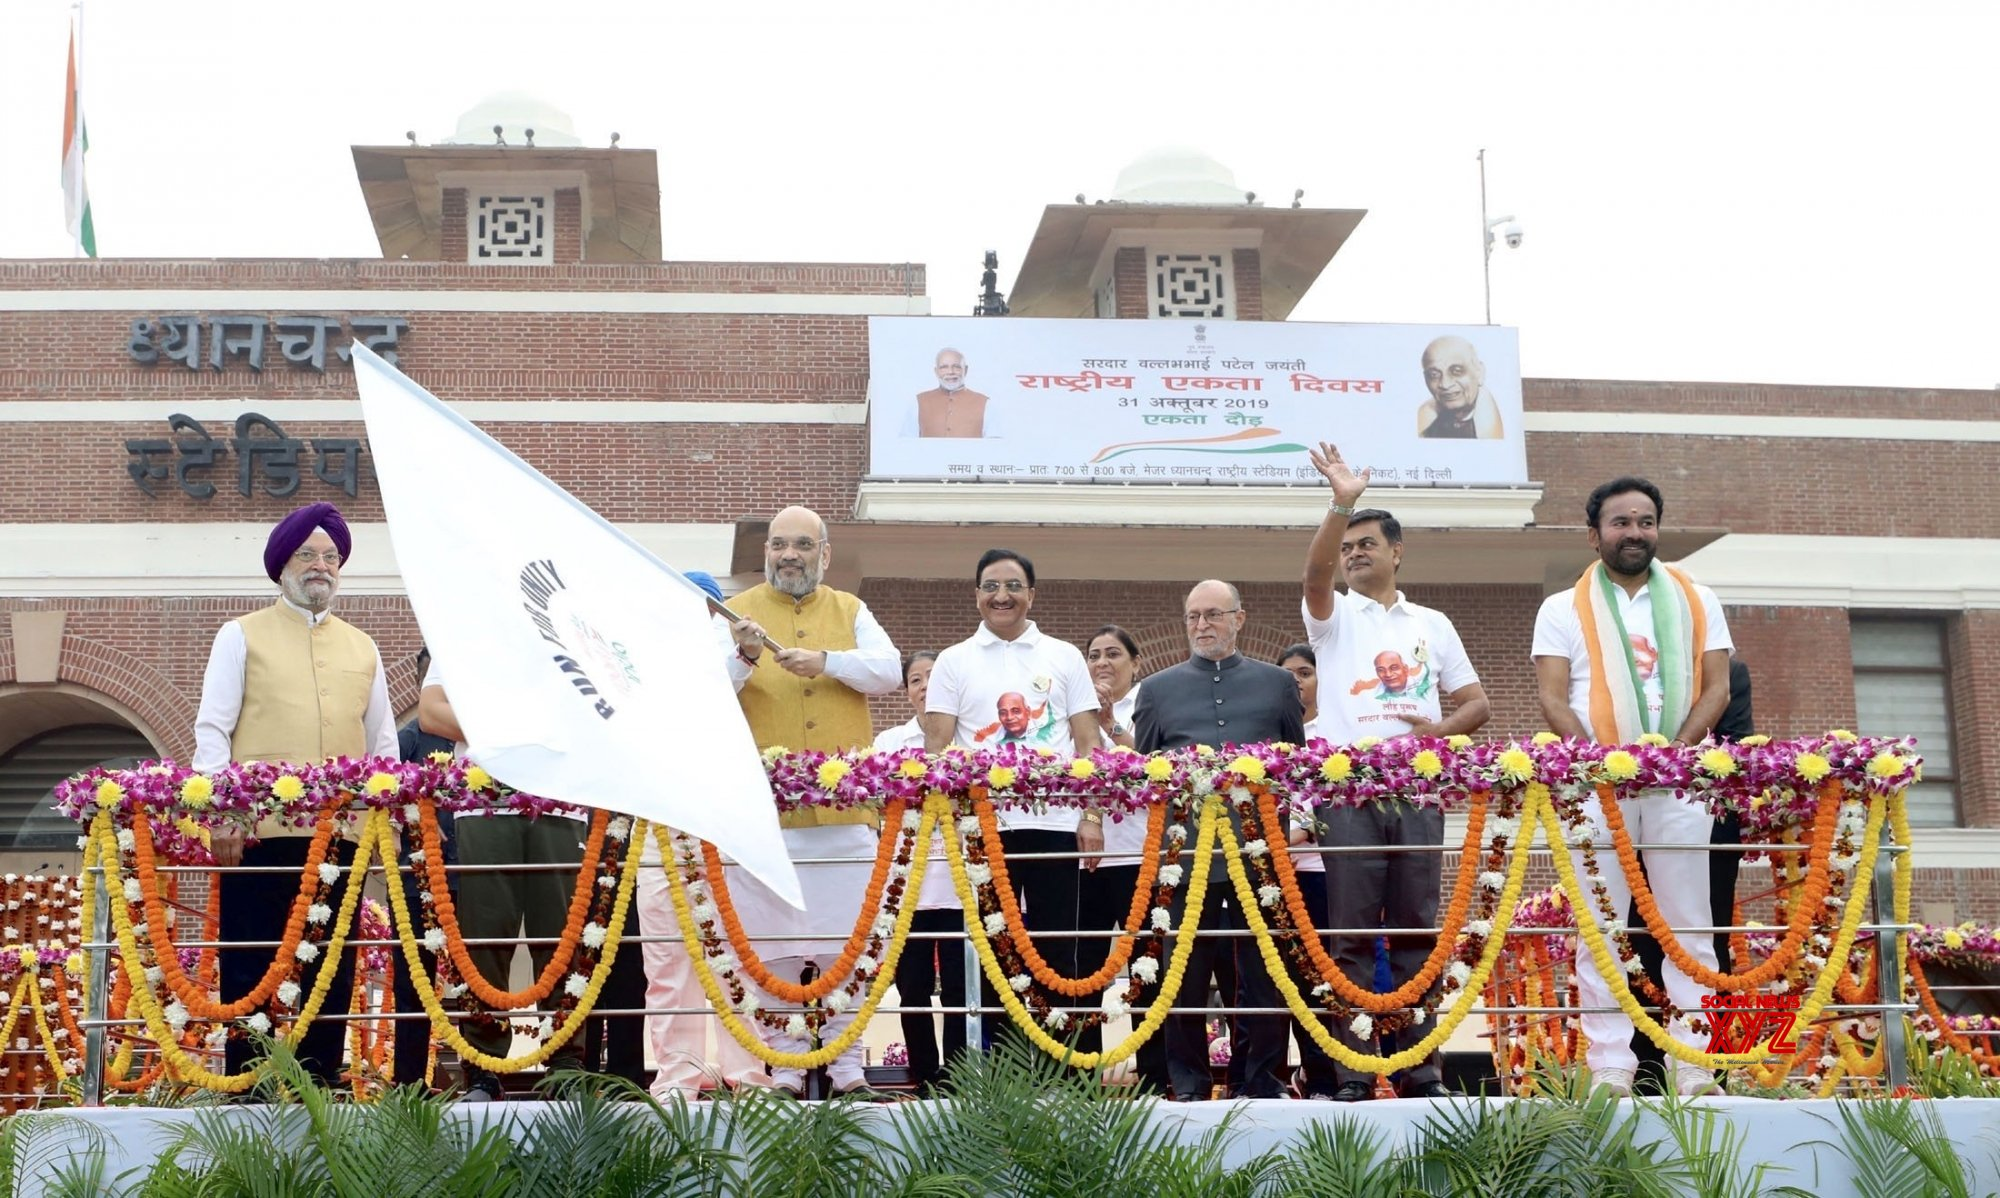 New Delhi: Amit Shah flags off 'Run for Unity' in Delhi #Gallery